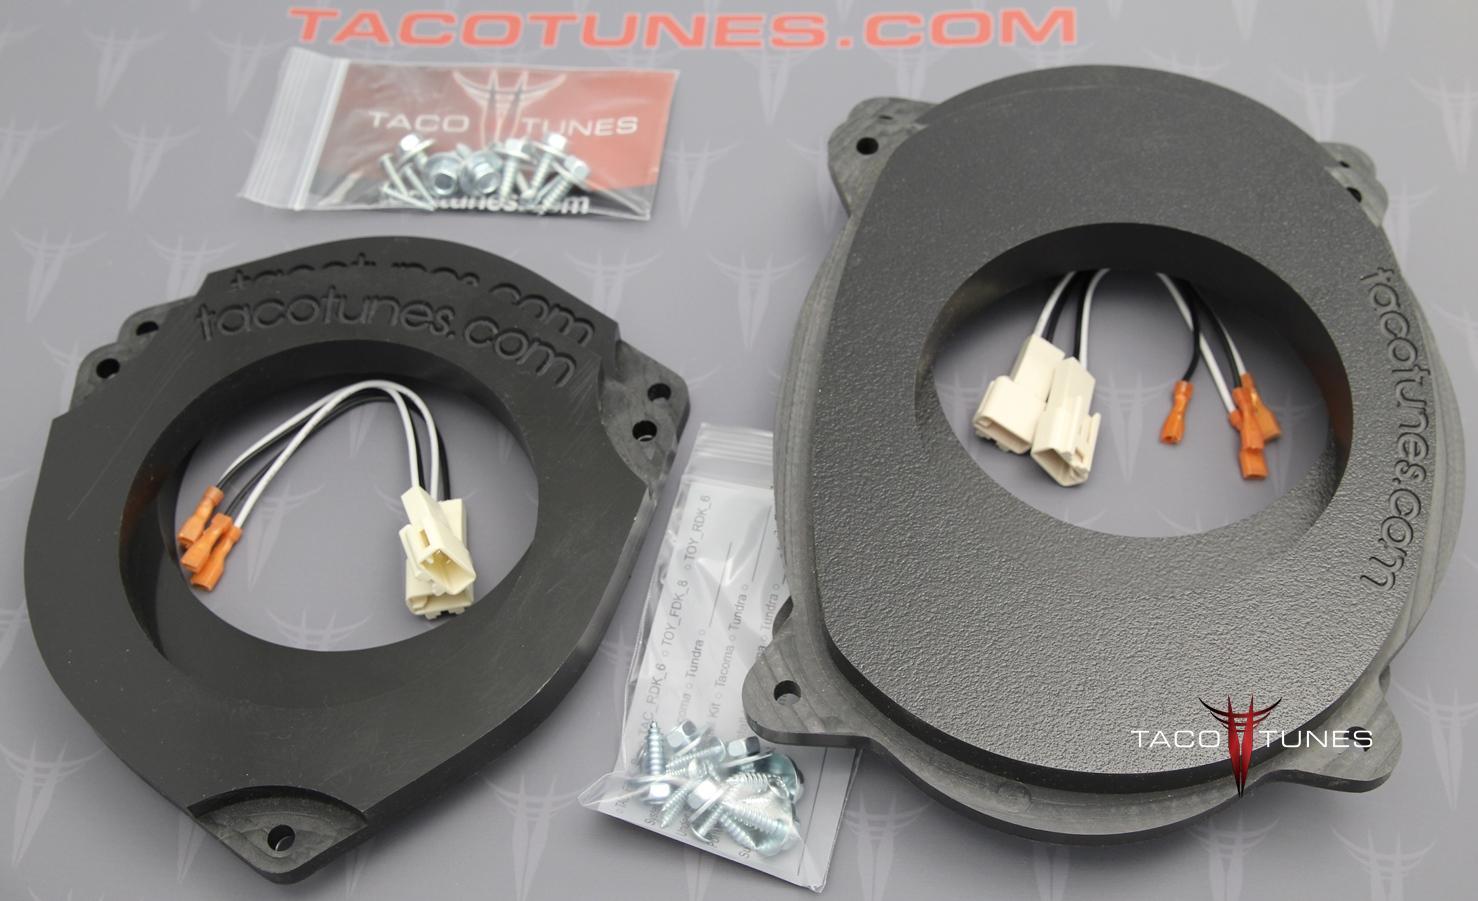 toyota tacoma 6 5 heavy duty speaker adapter installation kit. Black Bedroom Furniture Sets. Home Design Ideas